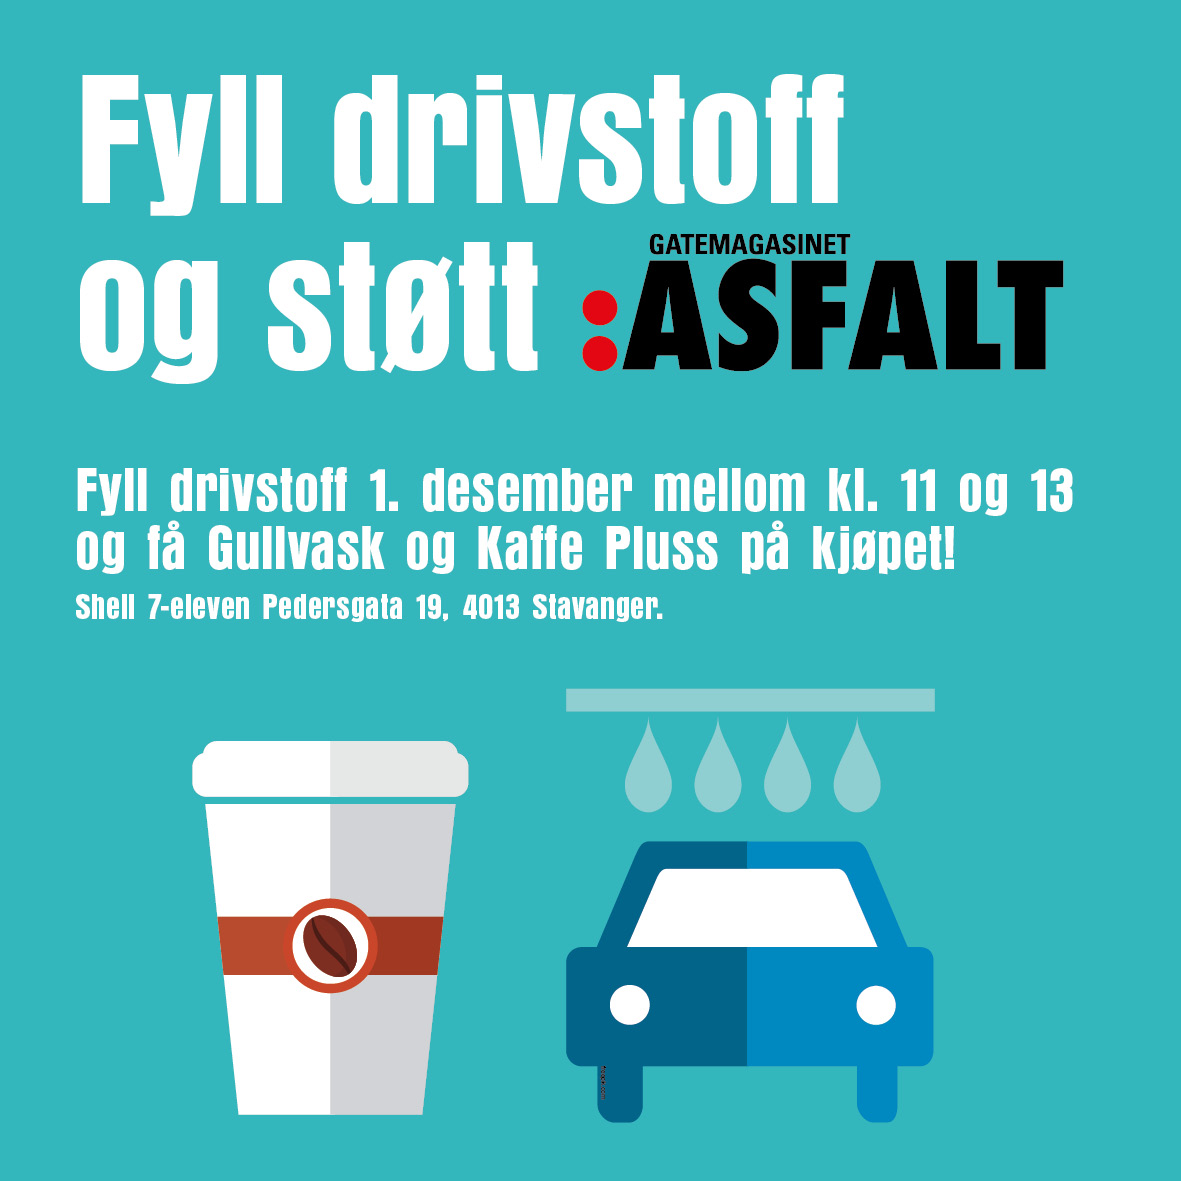 facebook_bensinpumpe-2.jpg